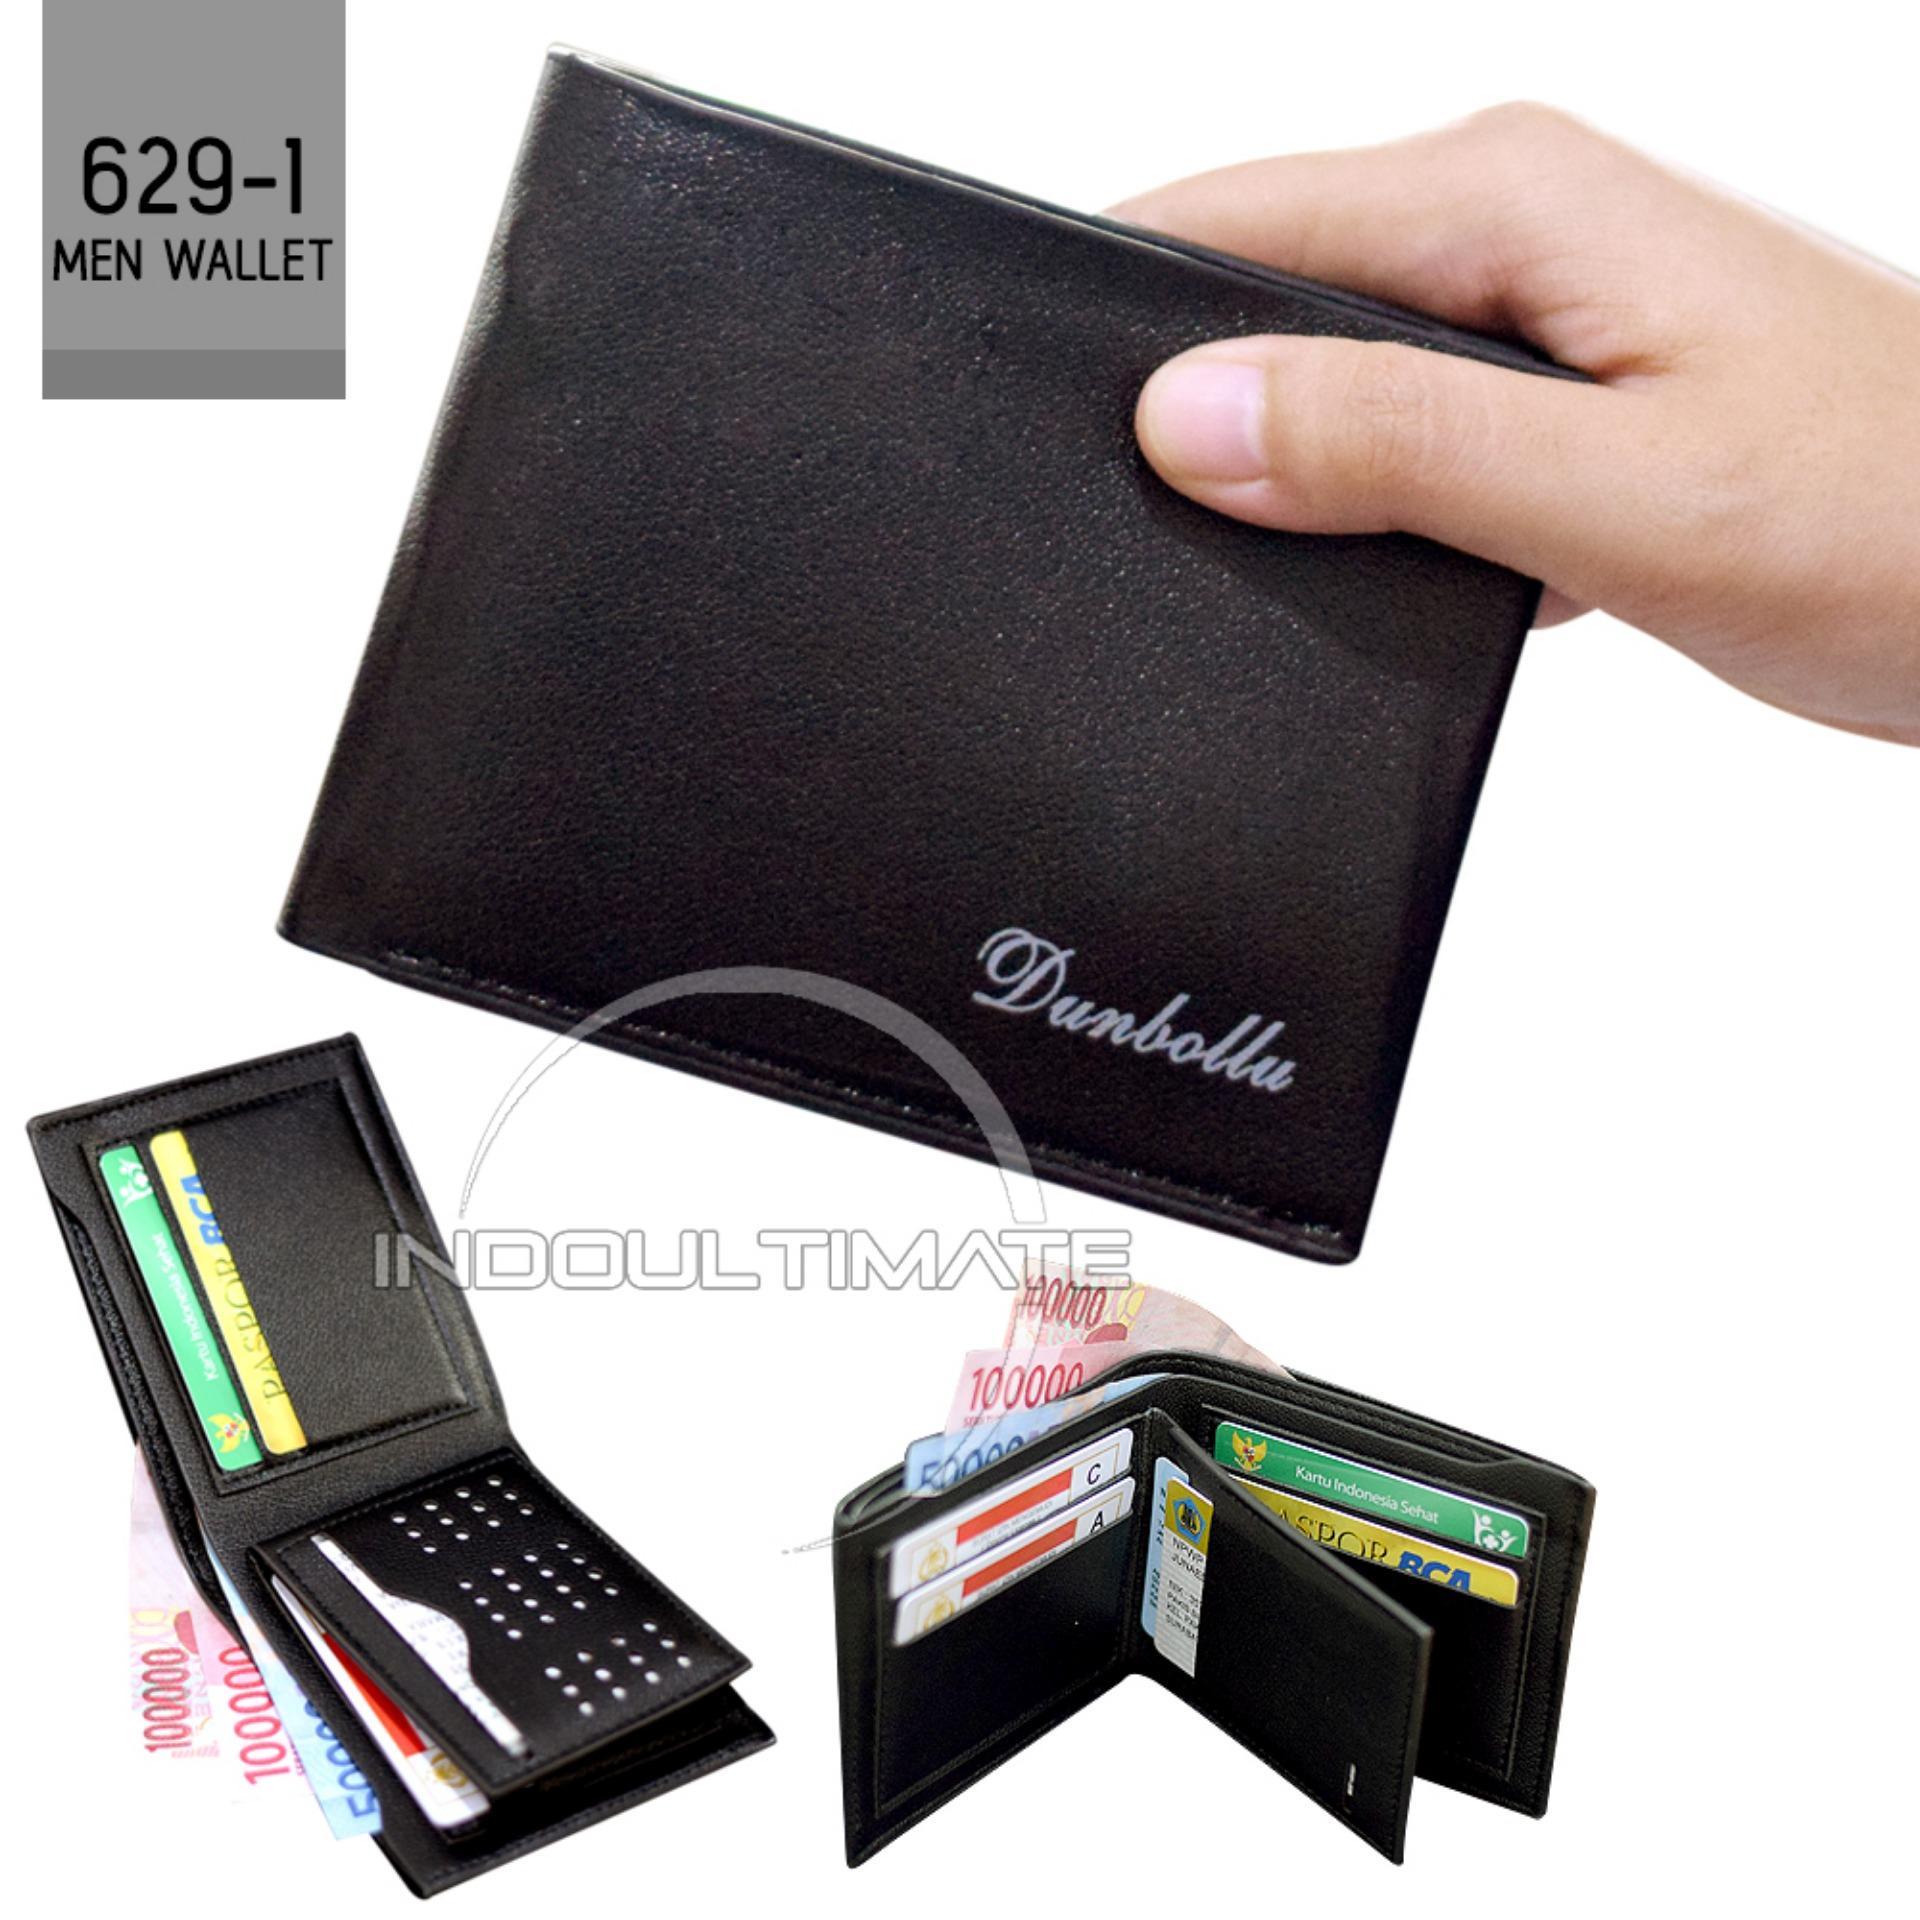 ULTIMATE DOMPET Pria FS 6291 - Black / Dompet Cowok Kulit Lipat Import Murah